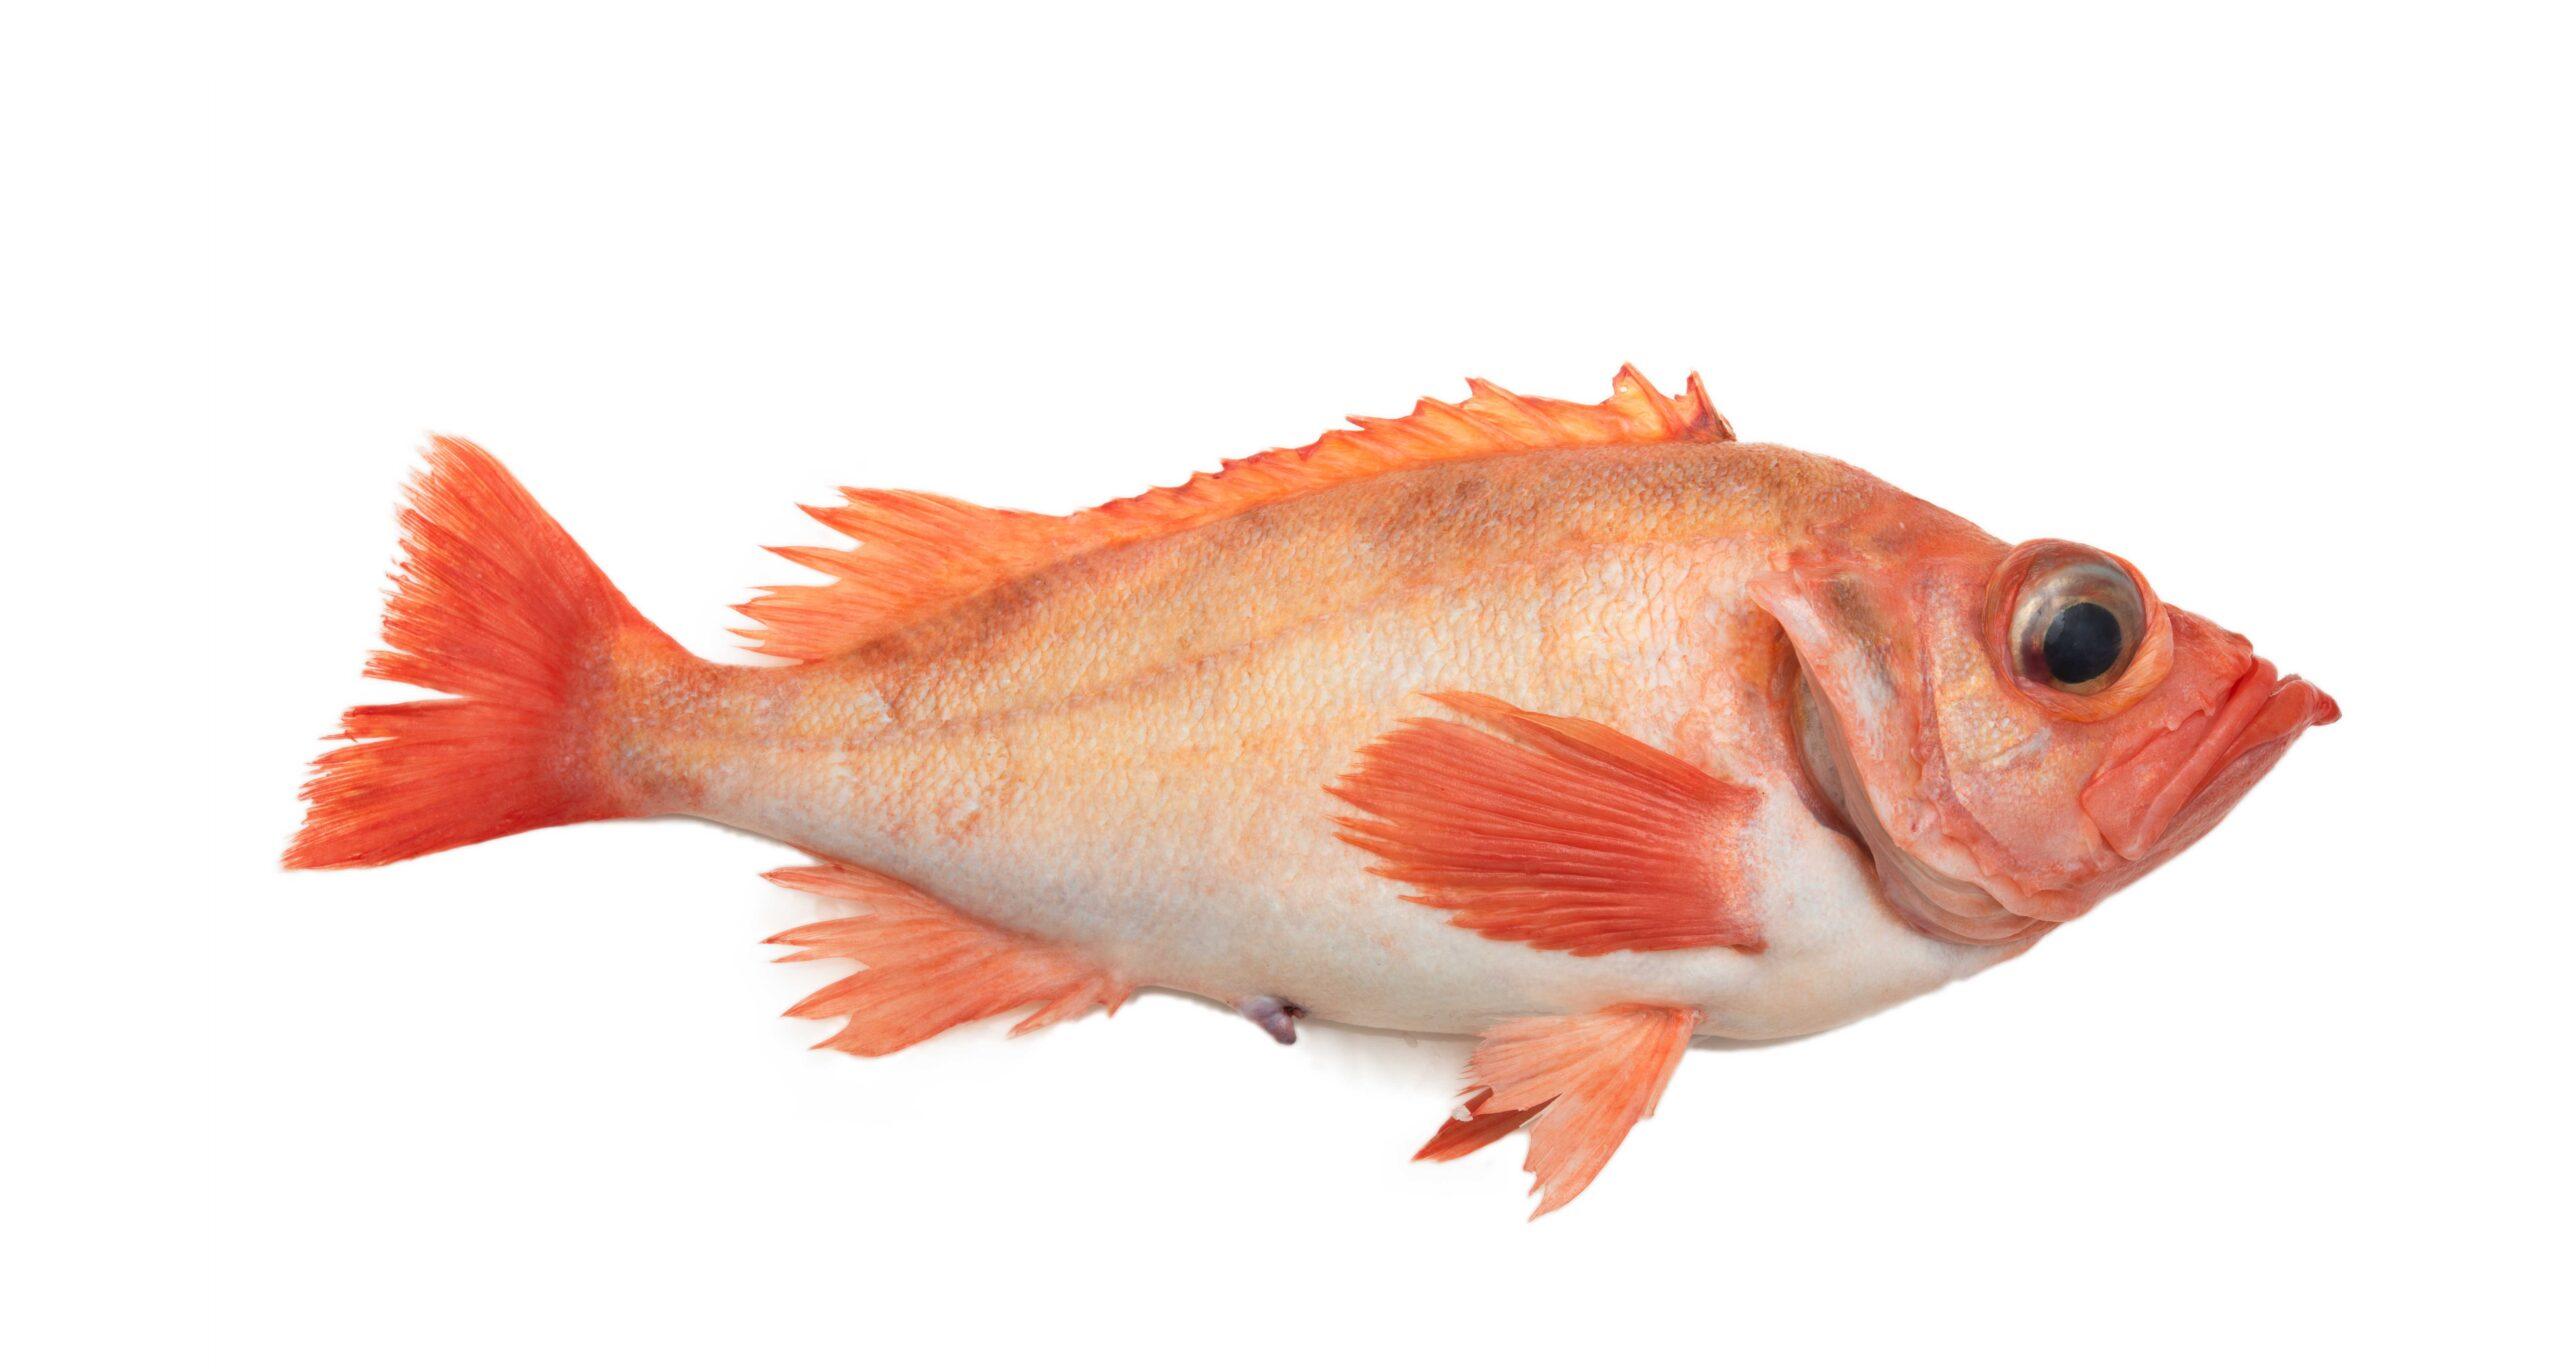 redfish-scaled-1-1-1-1-1-1-1.jpg